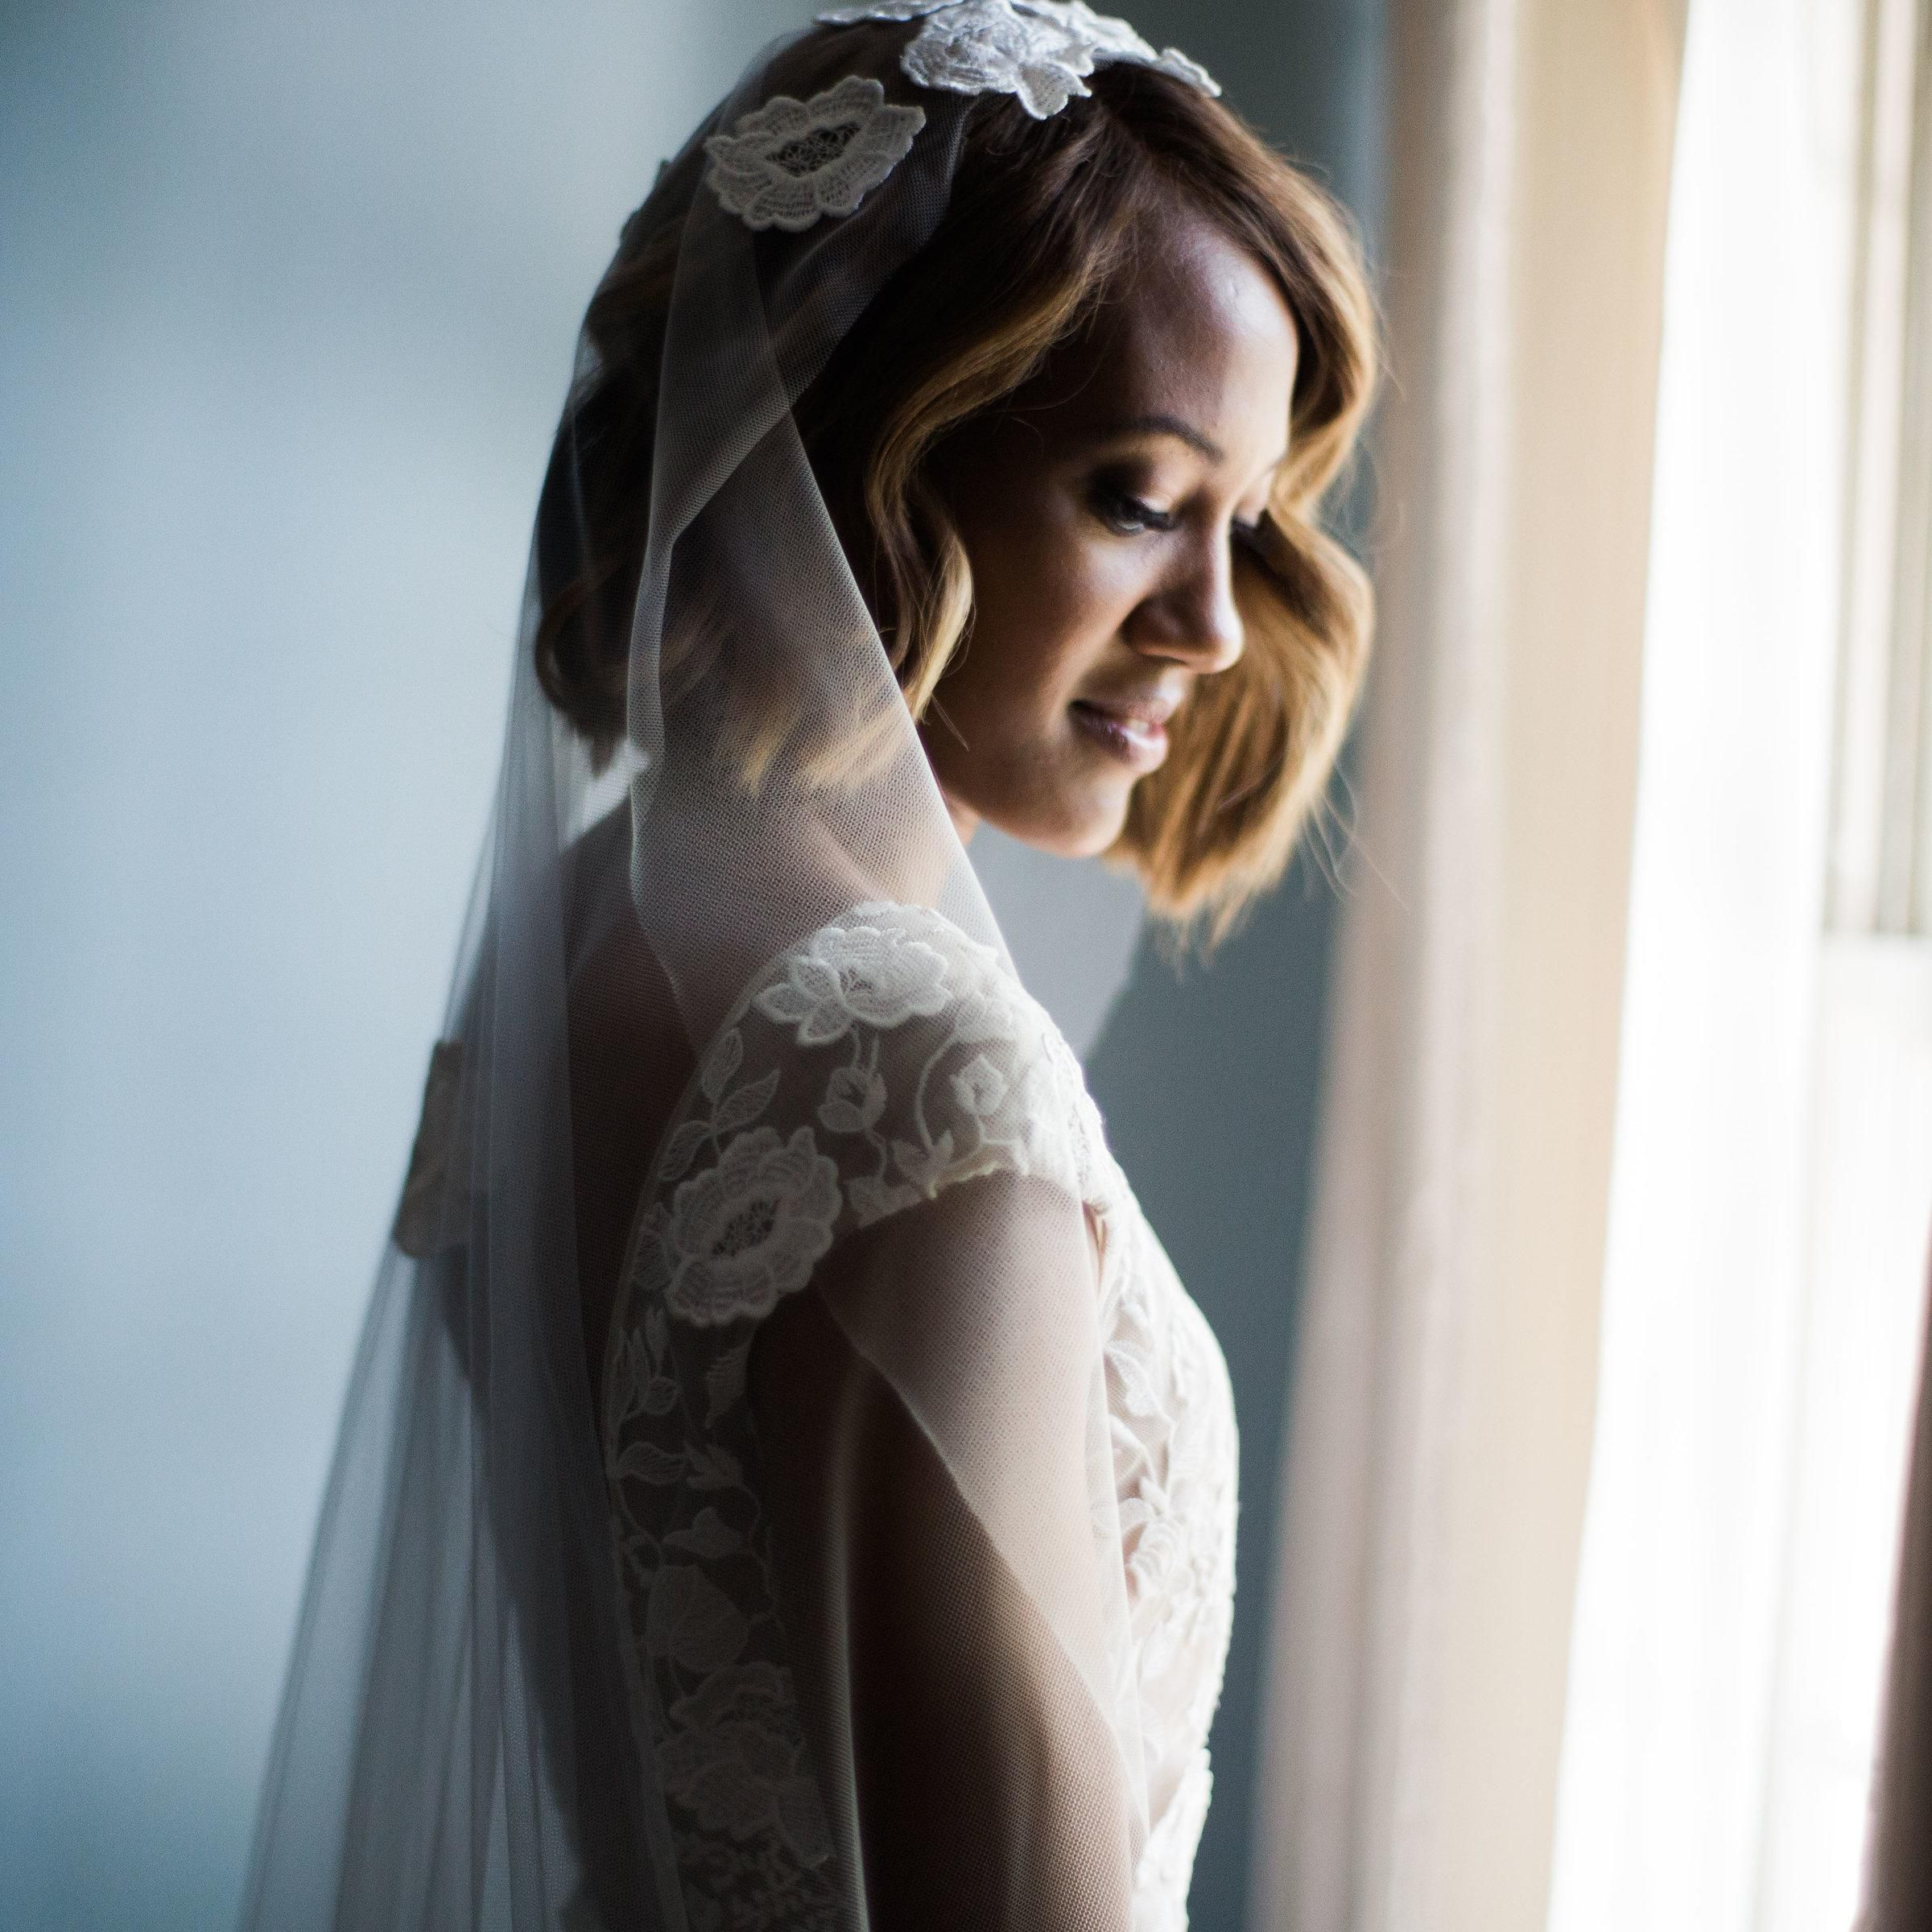 Beach Wedding Dresses Made To Perfection Spaghetti Strap Wedding